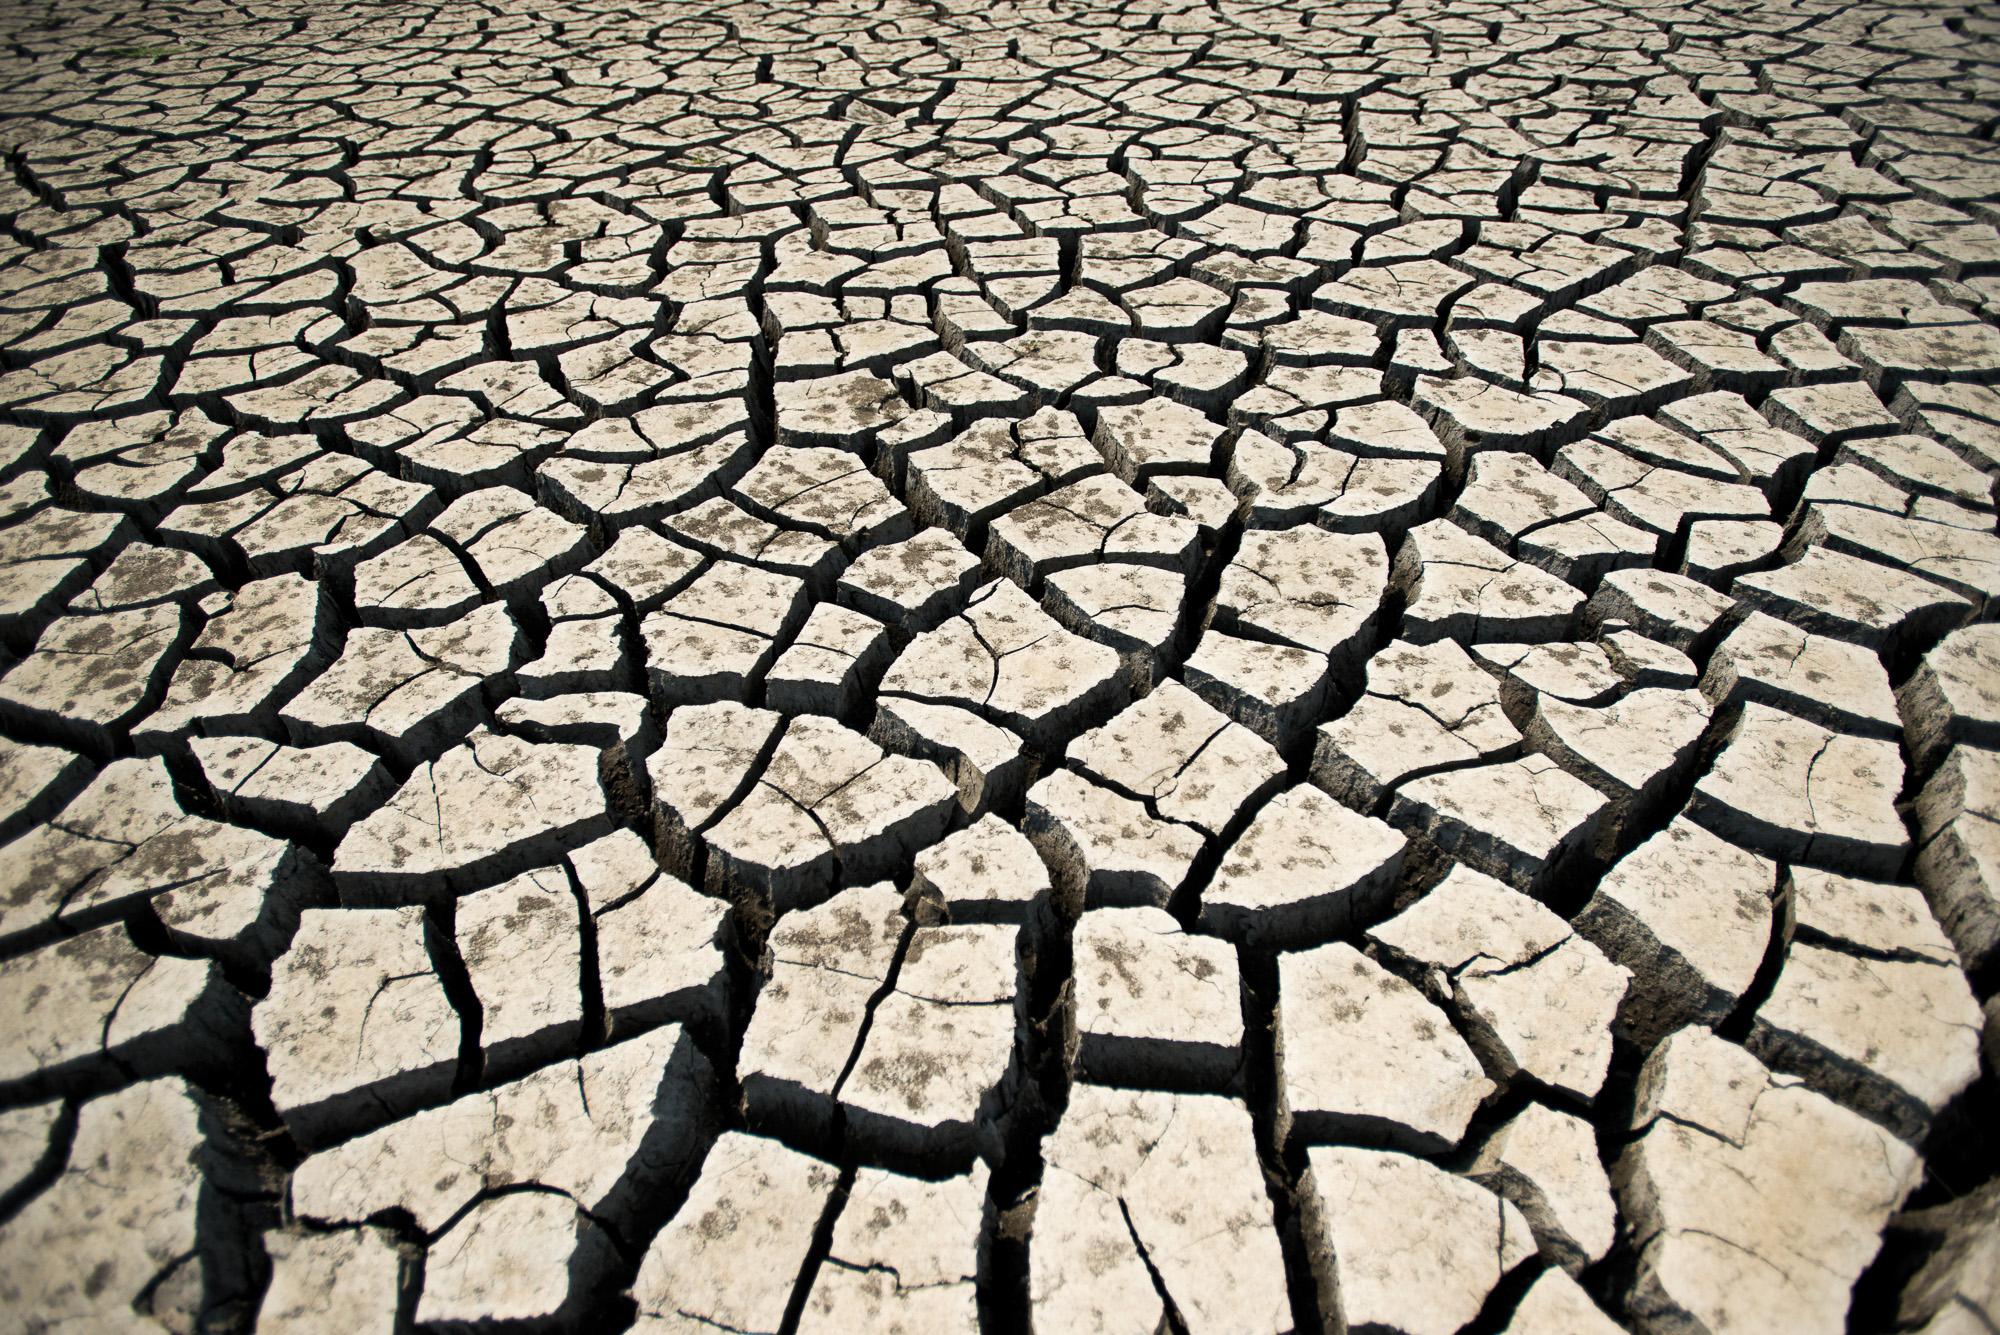 dry_lake_bed_brittany_app.jpg